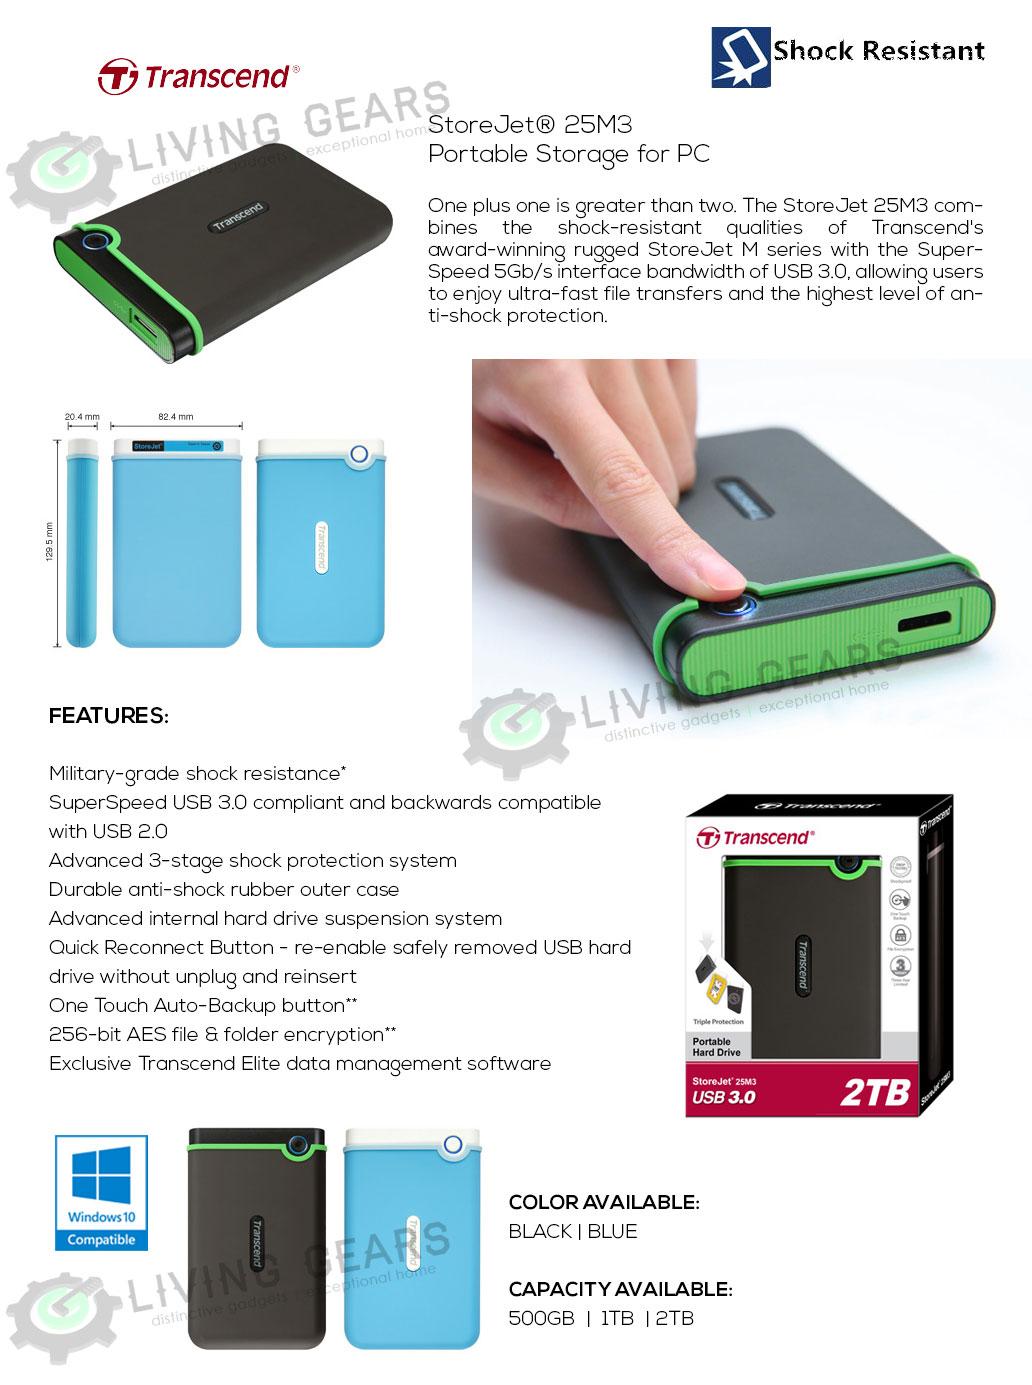 Transcend Storejet Anti Shock 25m3 Usb 30 Rugged Portable External Hardisk Eksternal 2 Tb Hard Disk Drive 500gb 1tb 2tb